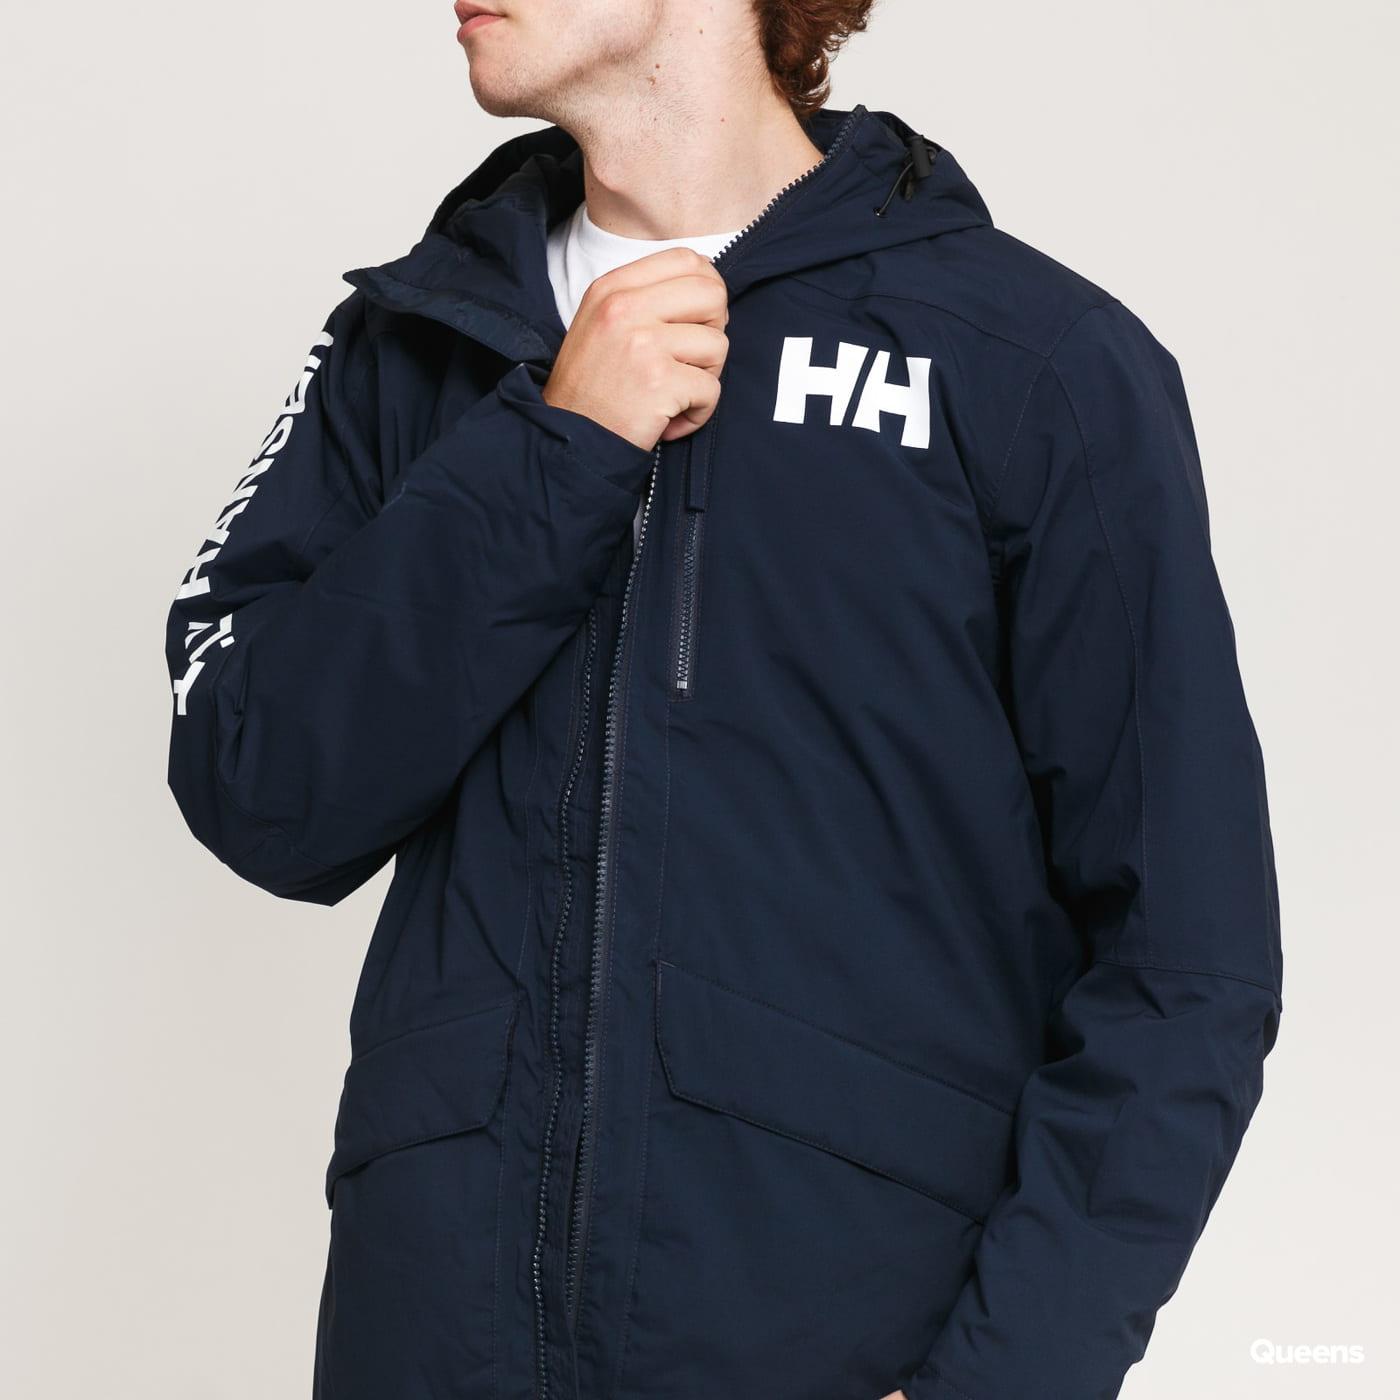 Helly Hansen Active Fall 2 Parka navy